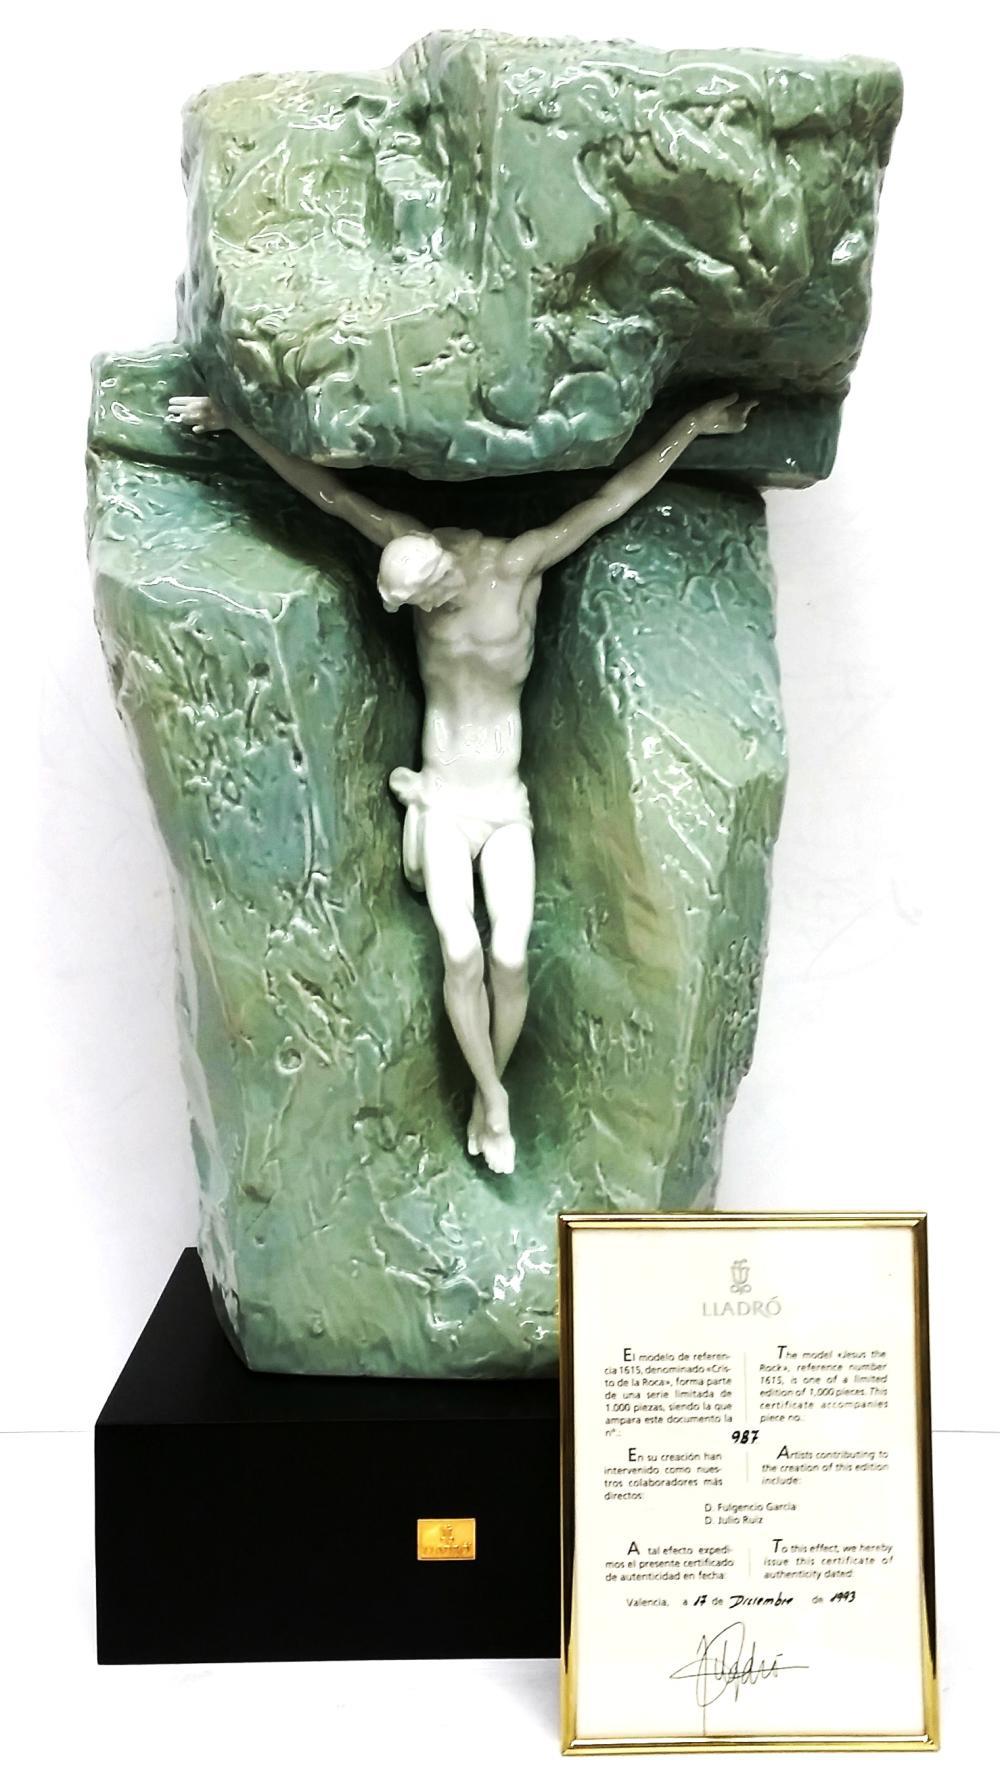 Vintage Lladro Jesus The Rock 1615 Limited Edition Porcelain Statue Base COA Box